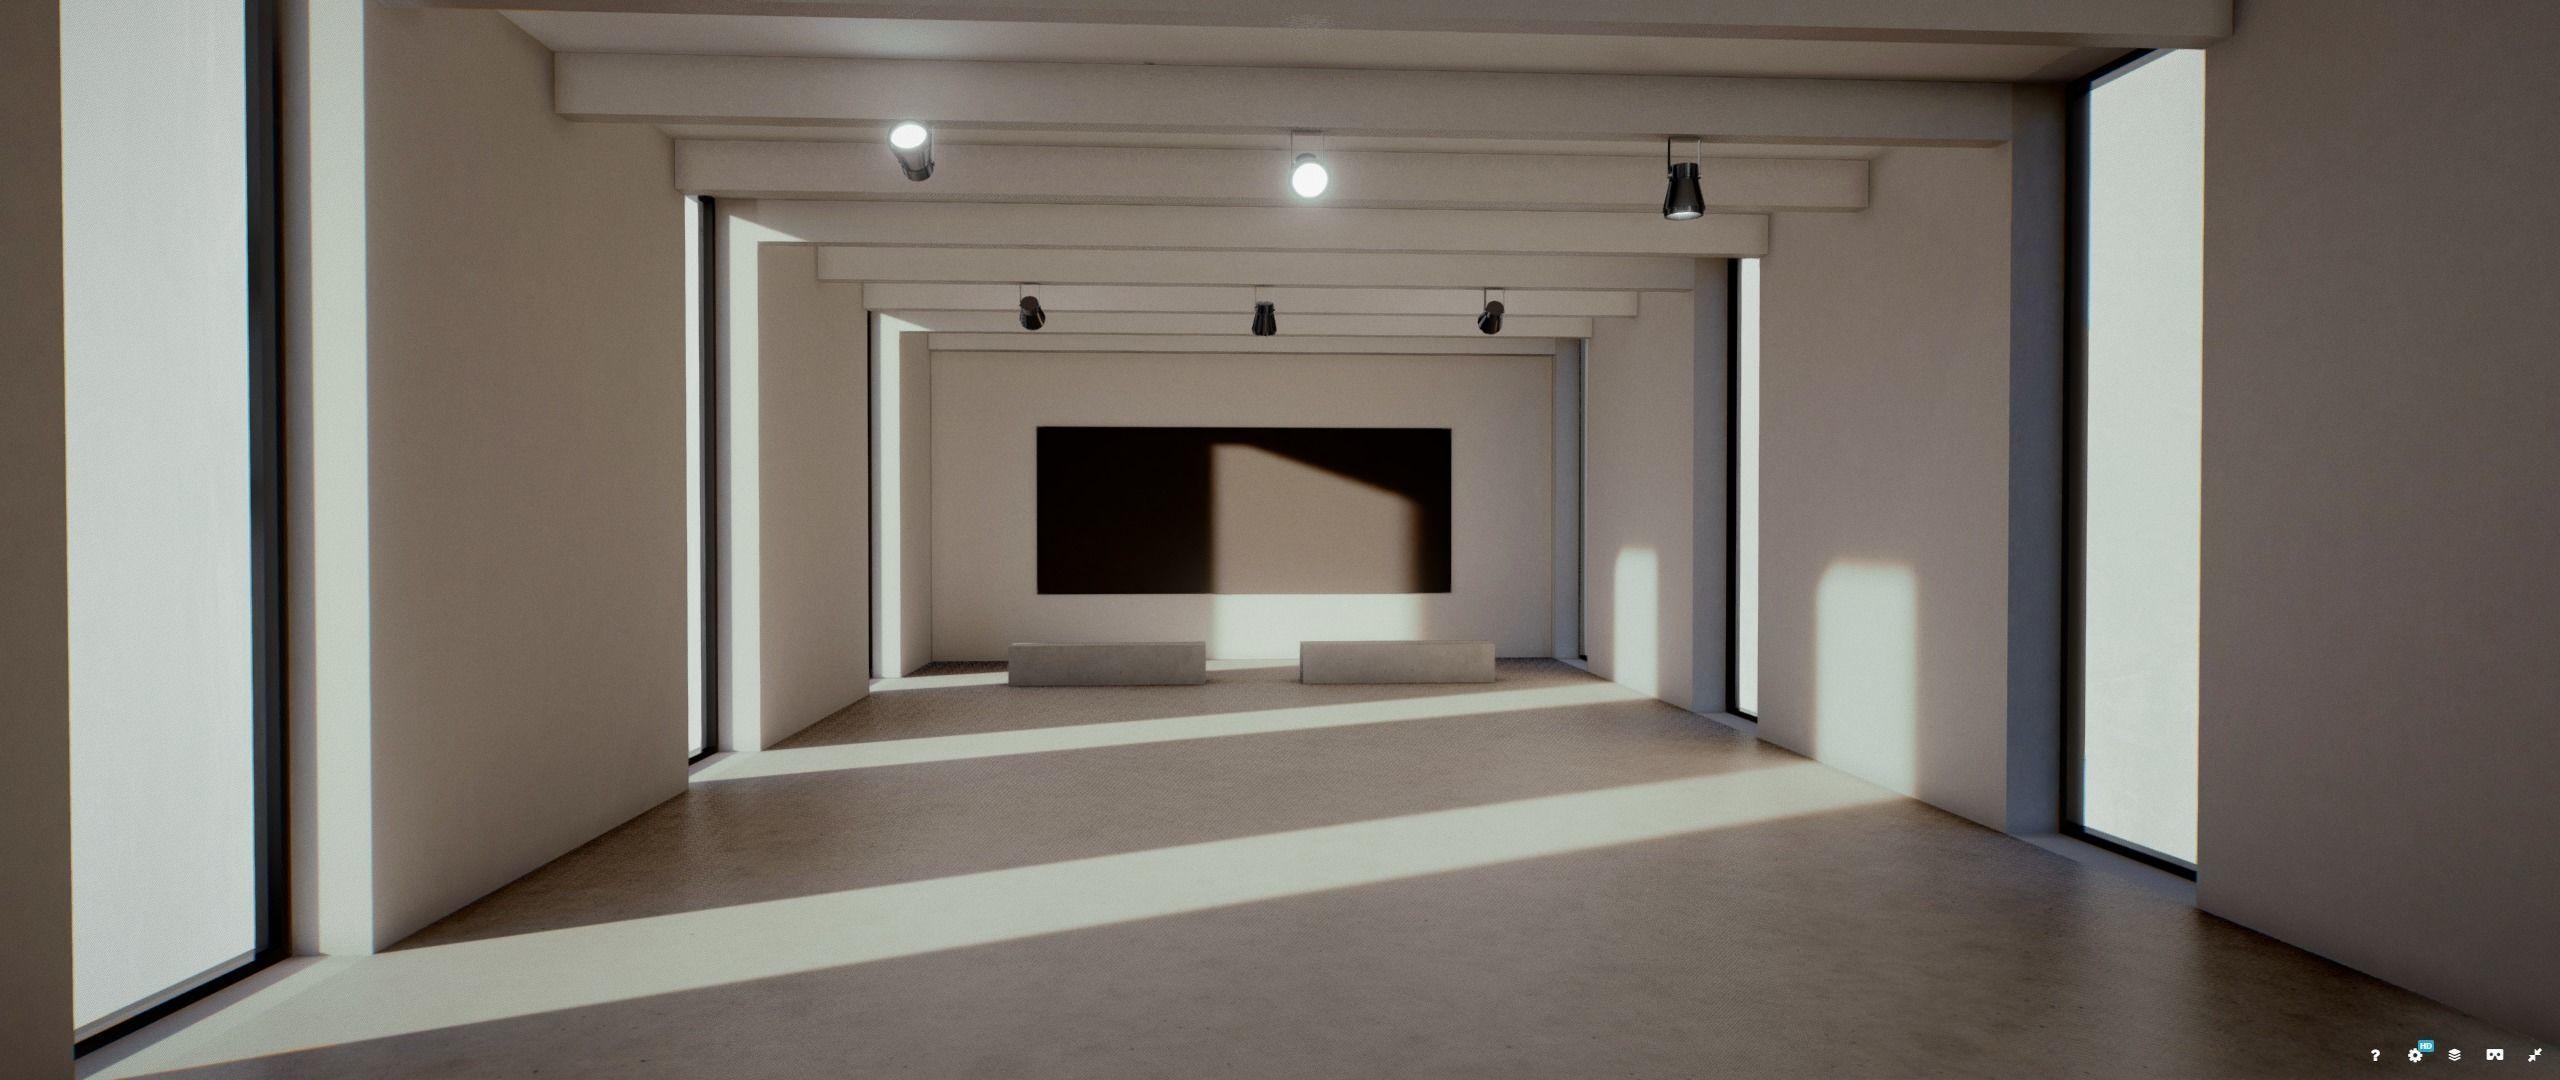 Moody Lighting Art Gallery 2019 Corona Max Scene